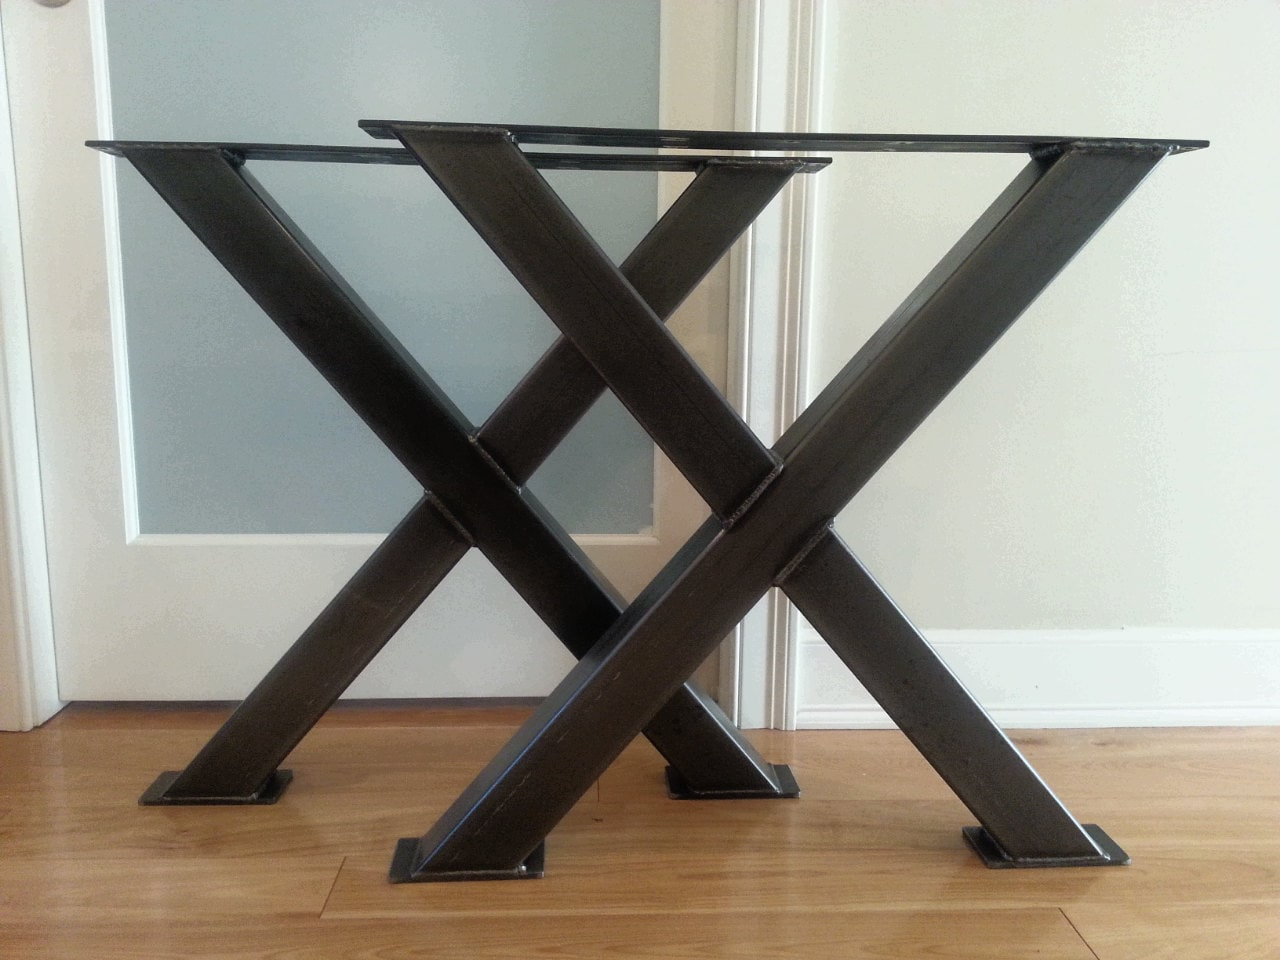 x metal table legs 3 steel table legs iron table rh etsy com steel table legs portland steel table legs ebay